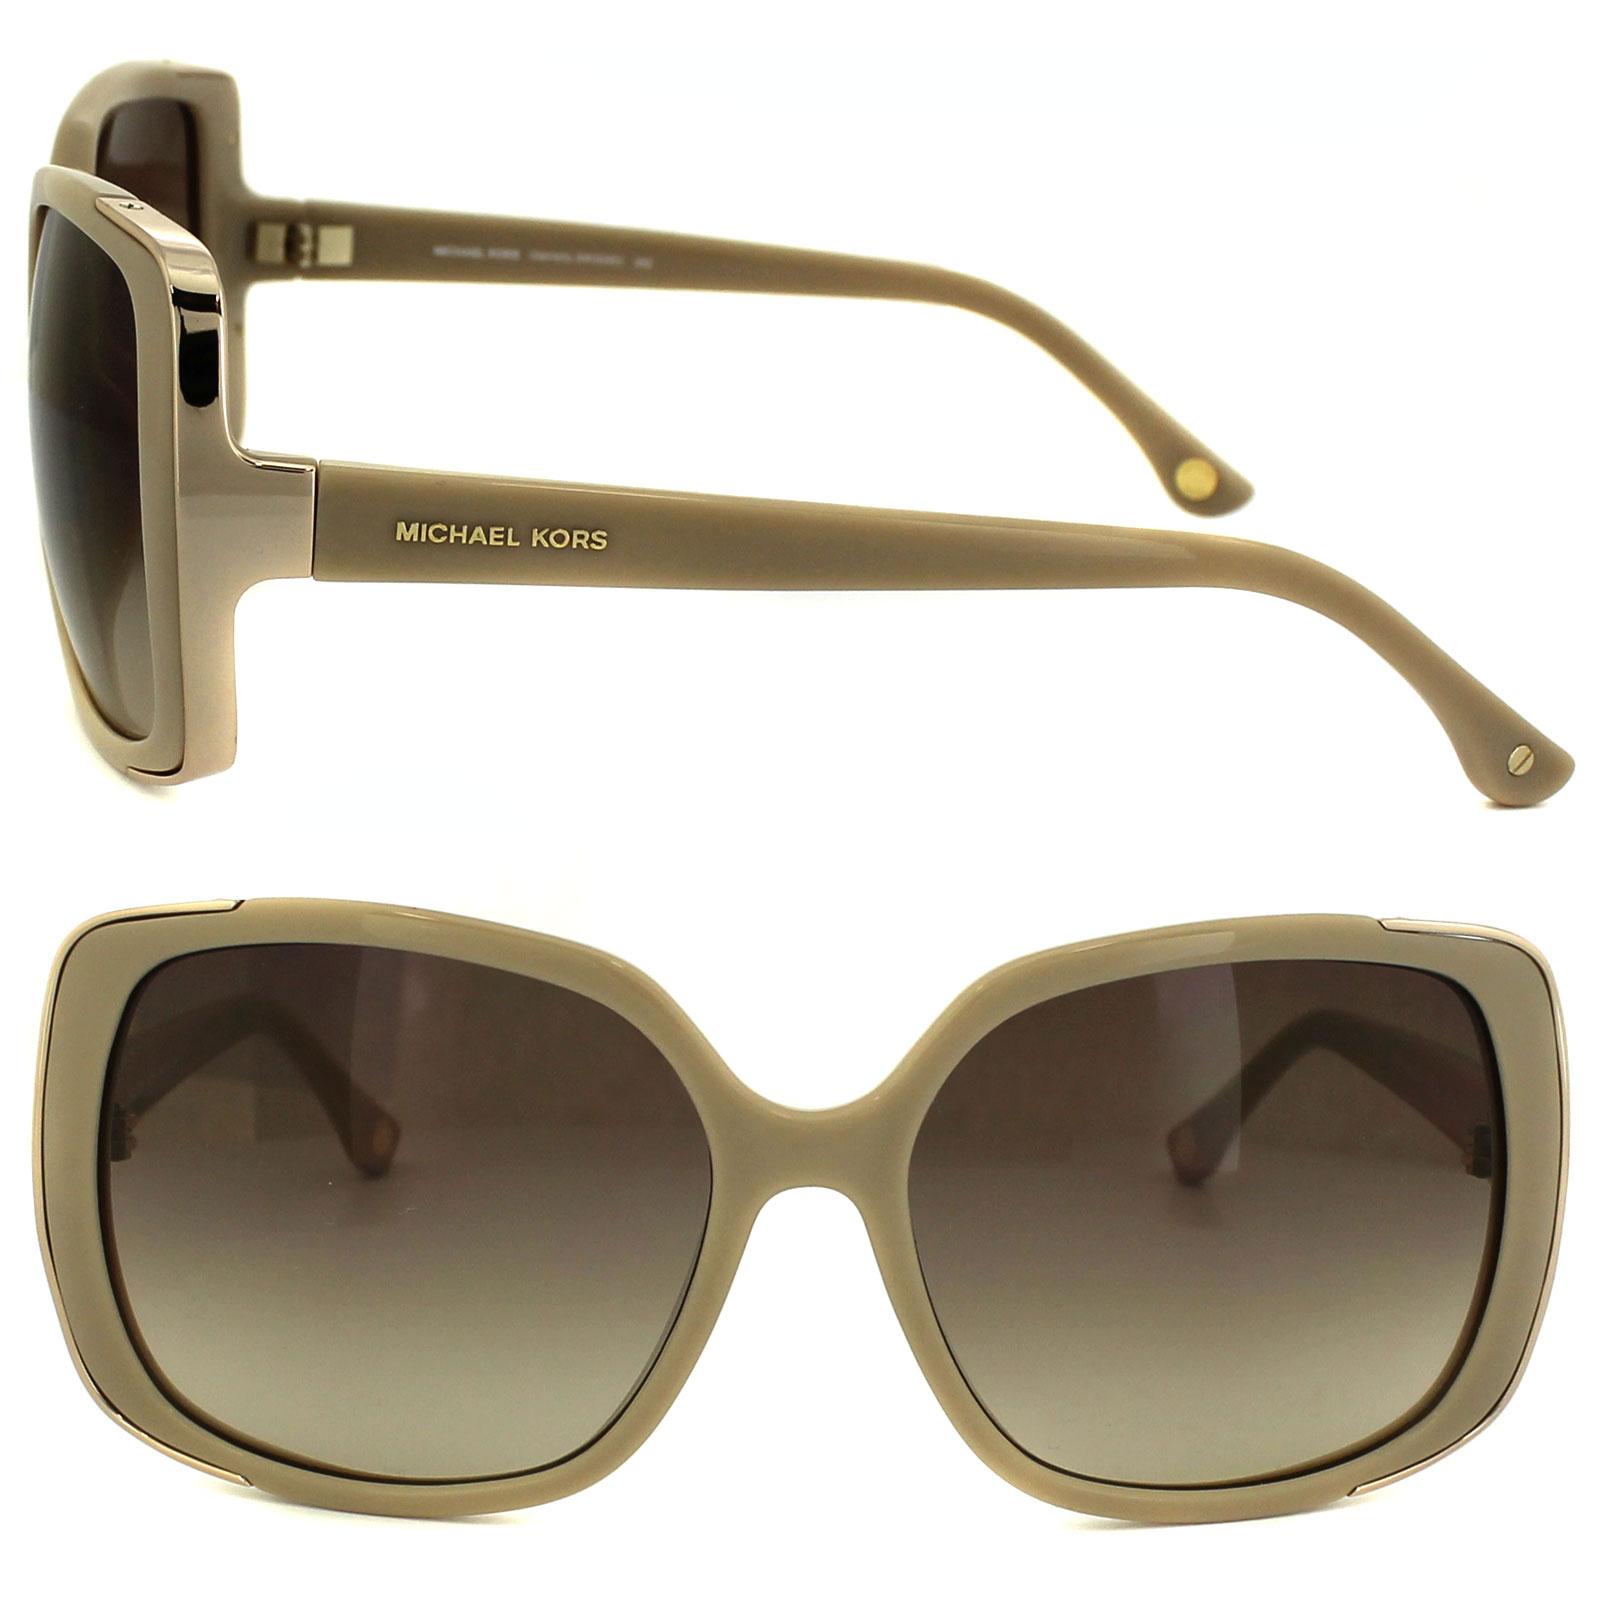 ad3f3cd122 Michael Kors Gabriella MKS290 Sunglasses Thumbnail 1 Michael Kors Gabriella  MKS290 Sunglasses Thumbnail 2 ...